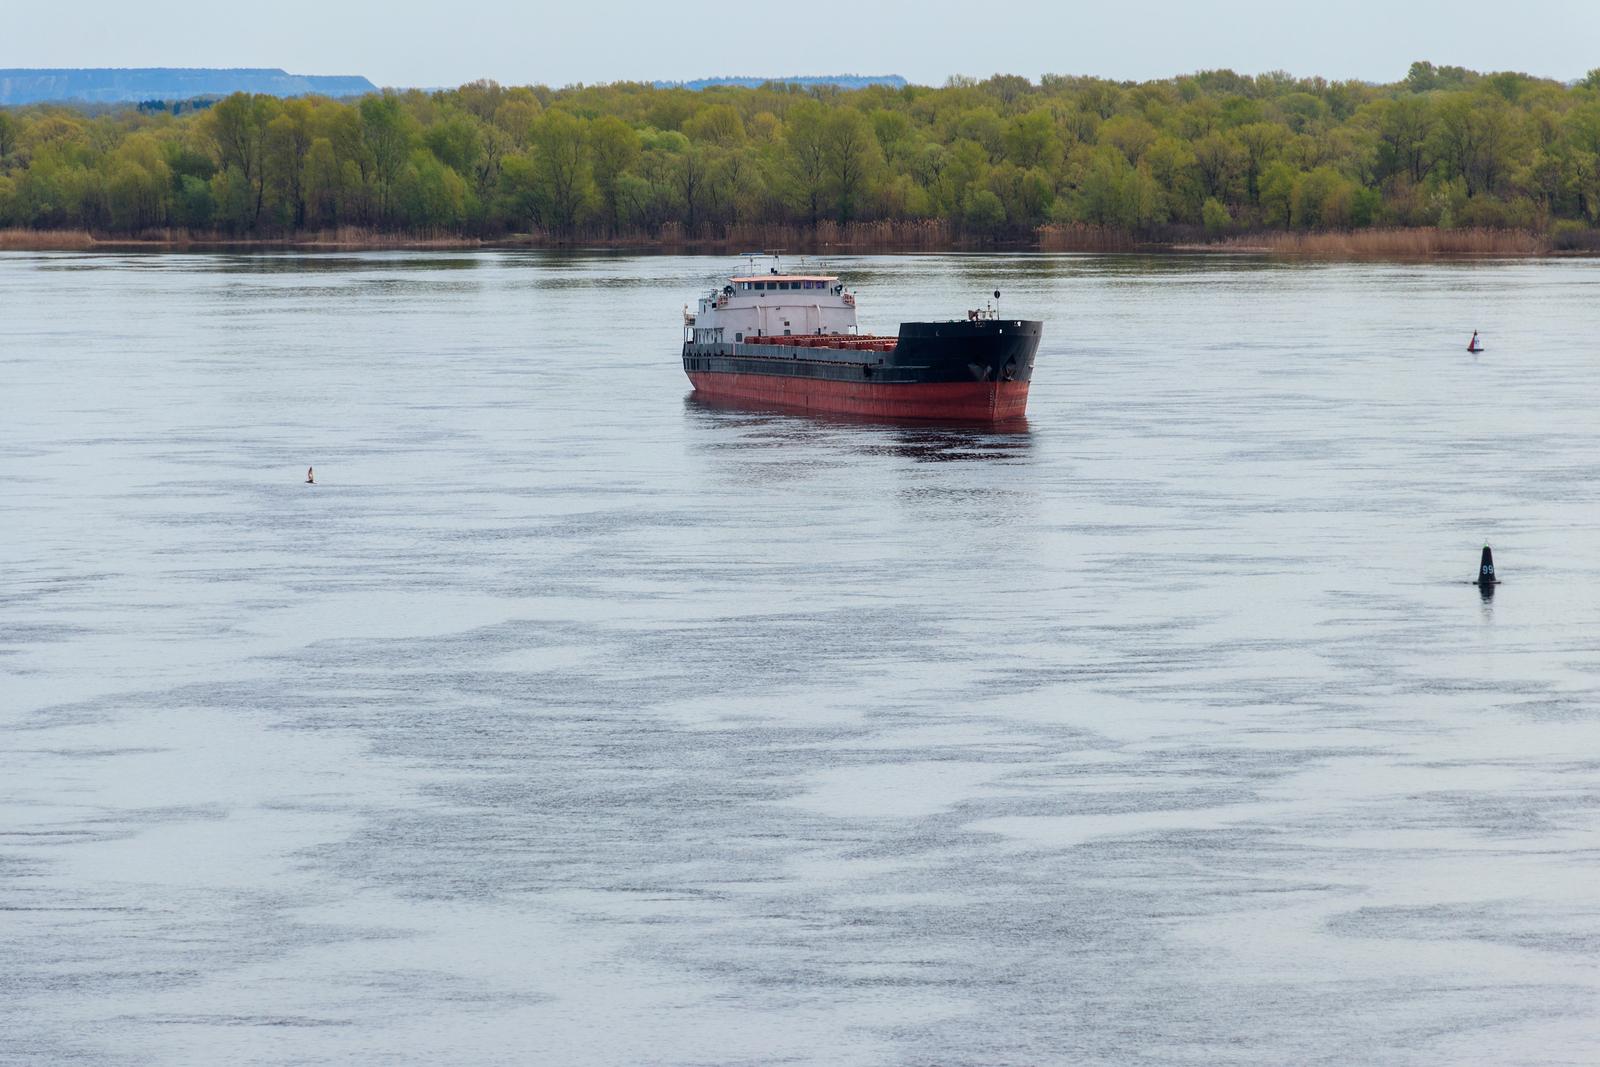 Belarus to build river port near Ukrainian border